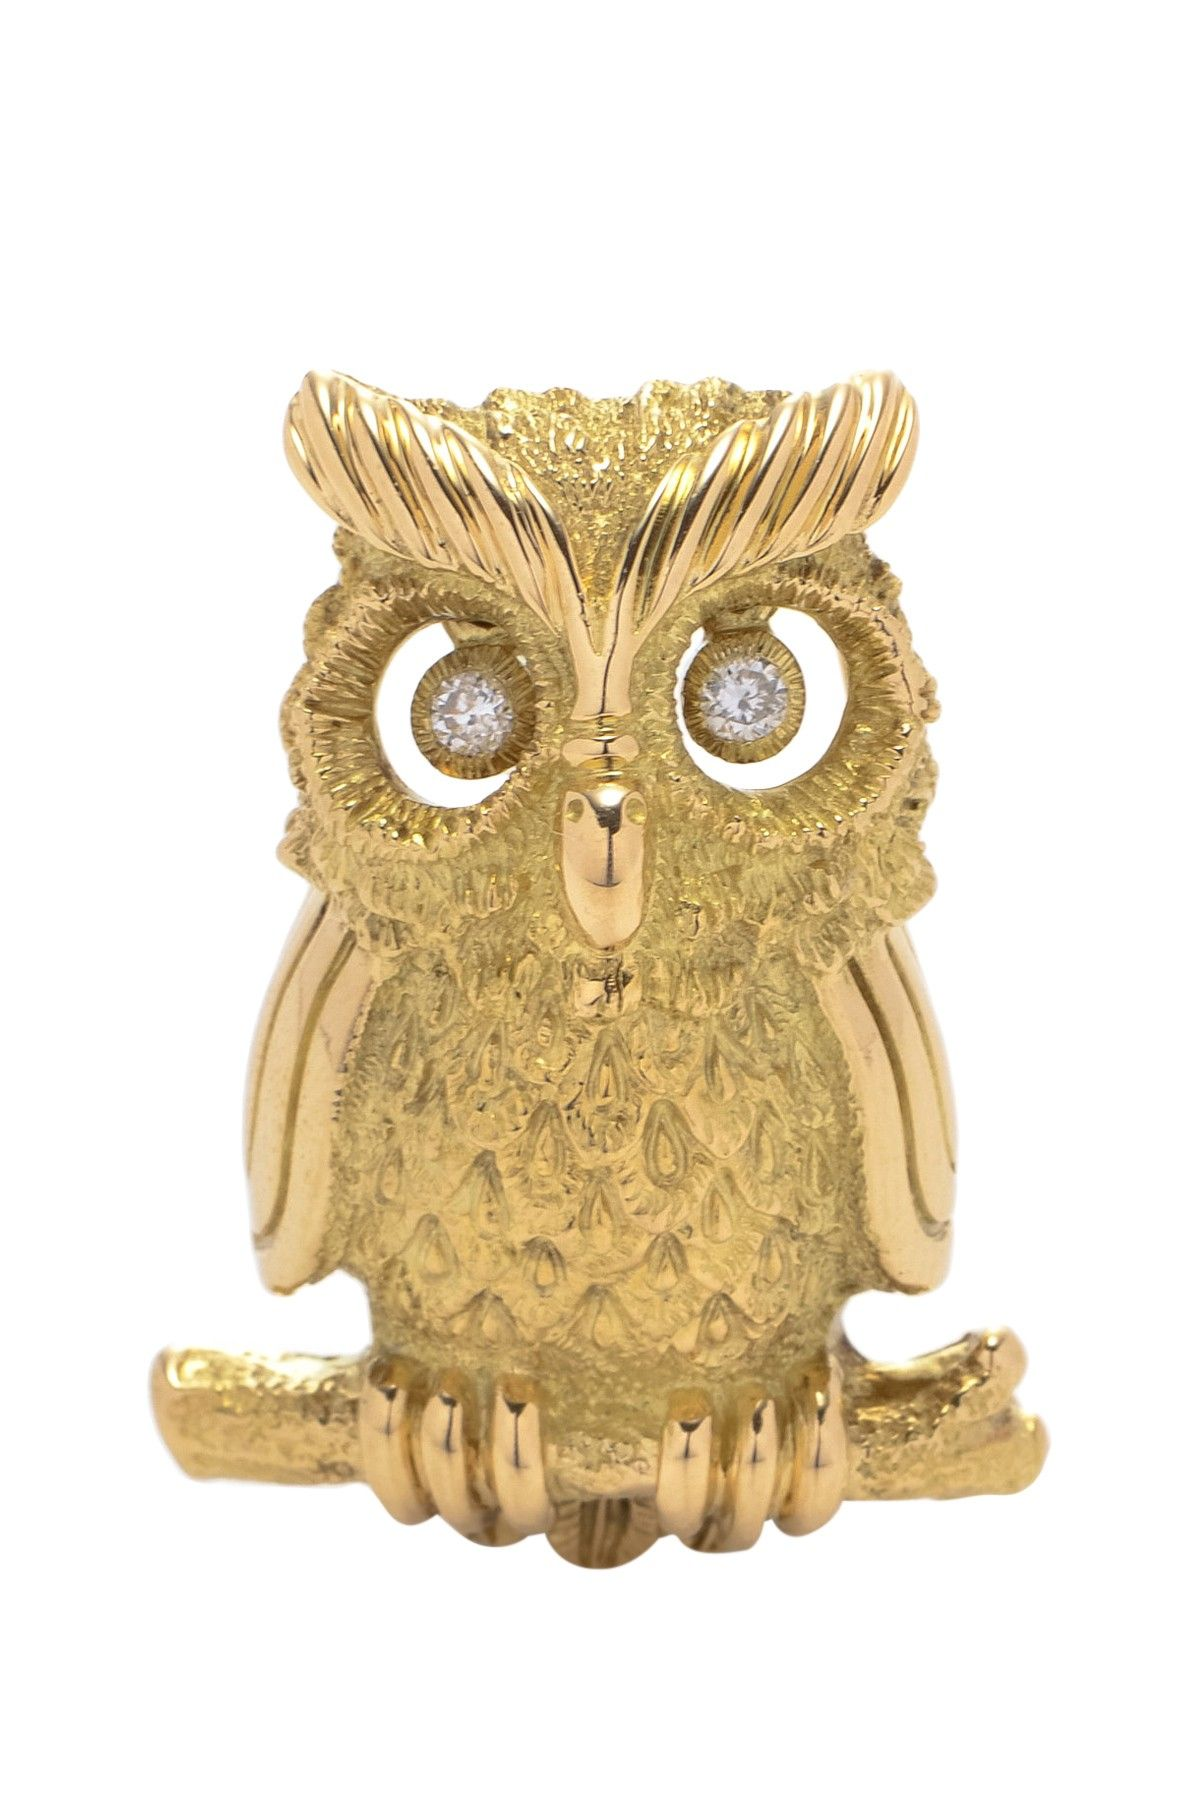 Vintage Estate Jewelry 18K Gold Diamond Owl Brooch - 0.07 ctw